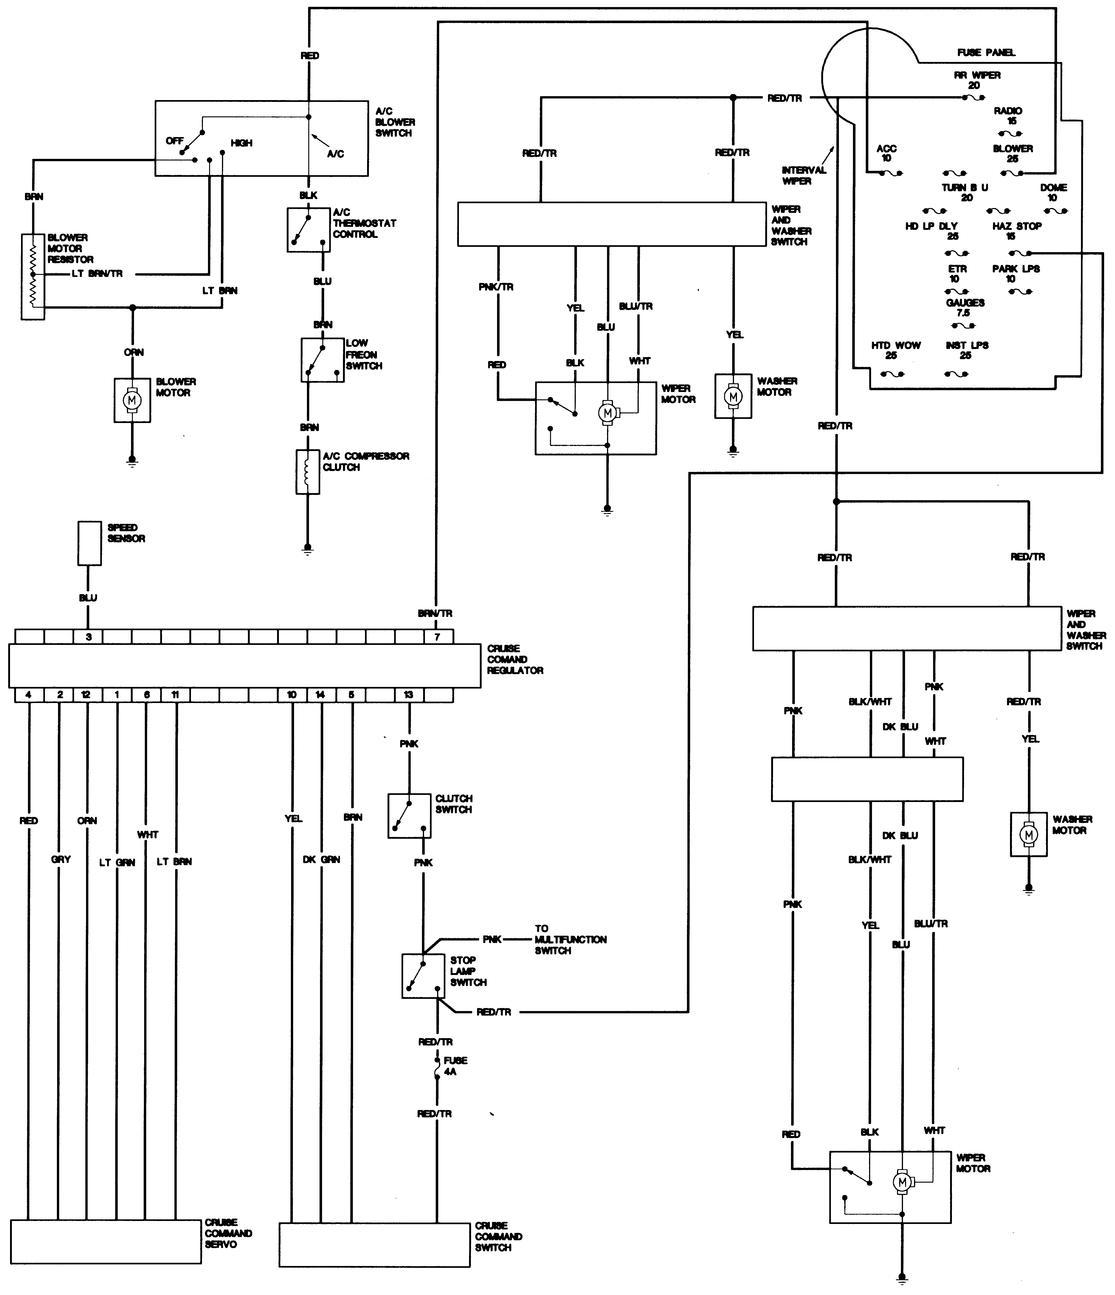 hight resolution of 1950 jeep cj wiring diagram geo storm wiring diagram carburator 1983 cj7 wiring diagram jeep cj5 dash wiring diagram